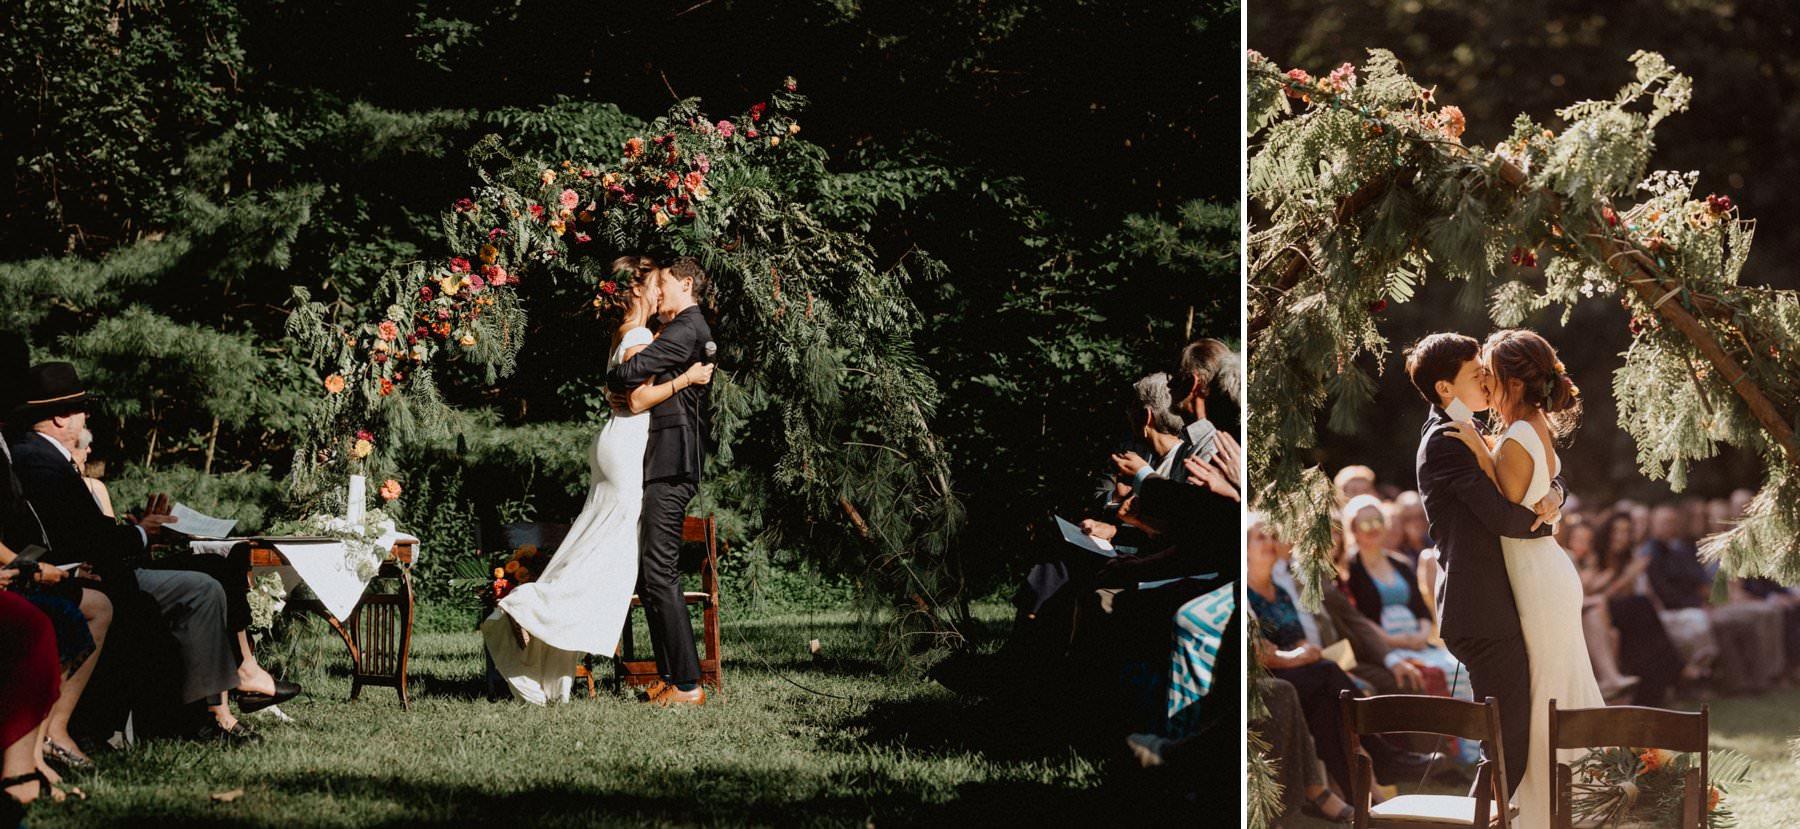 pennsylvania-private-estate-wedding-69.jpg